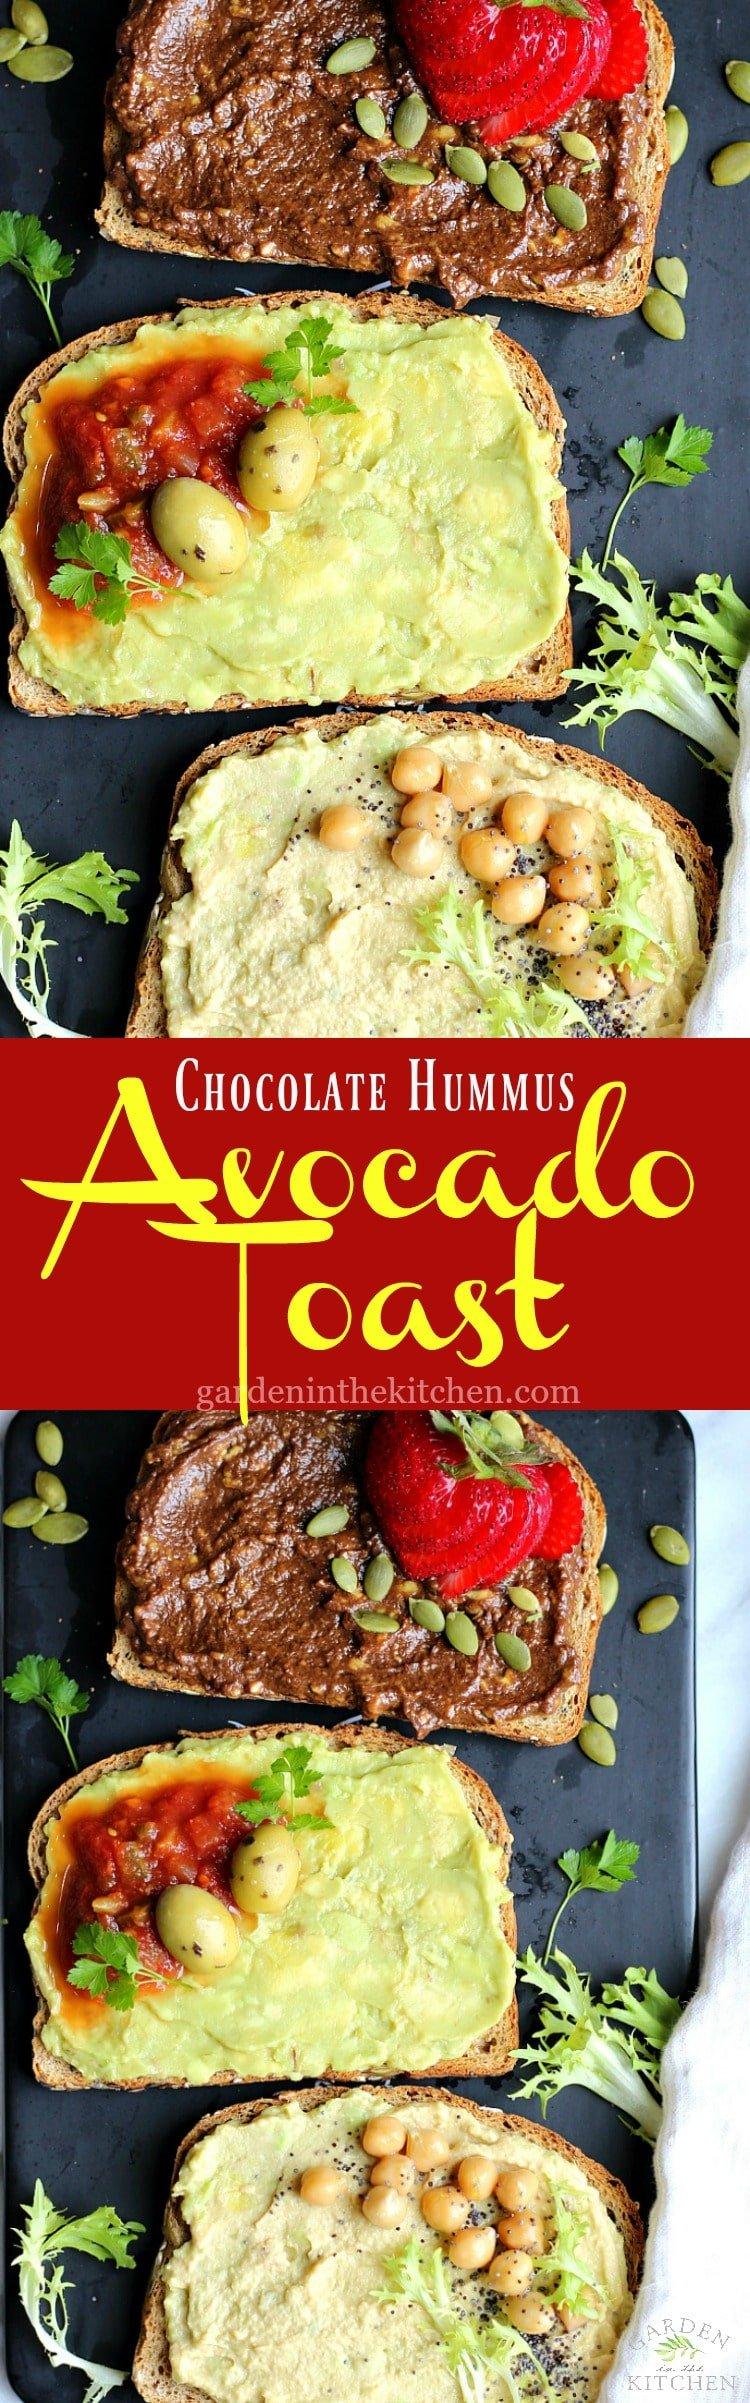 Chocolate Hummus Avocado Toast 3-Ways | Garden in the Kitchen